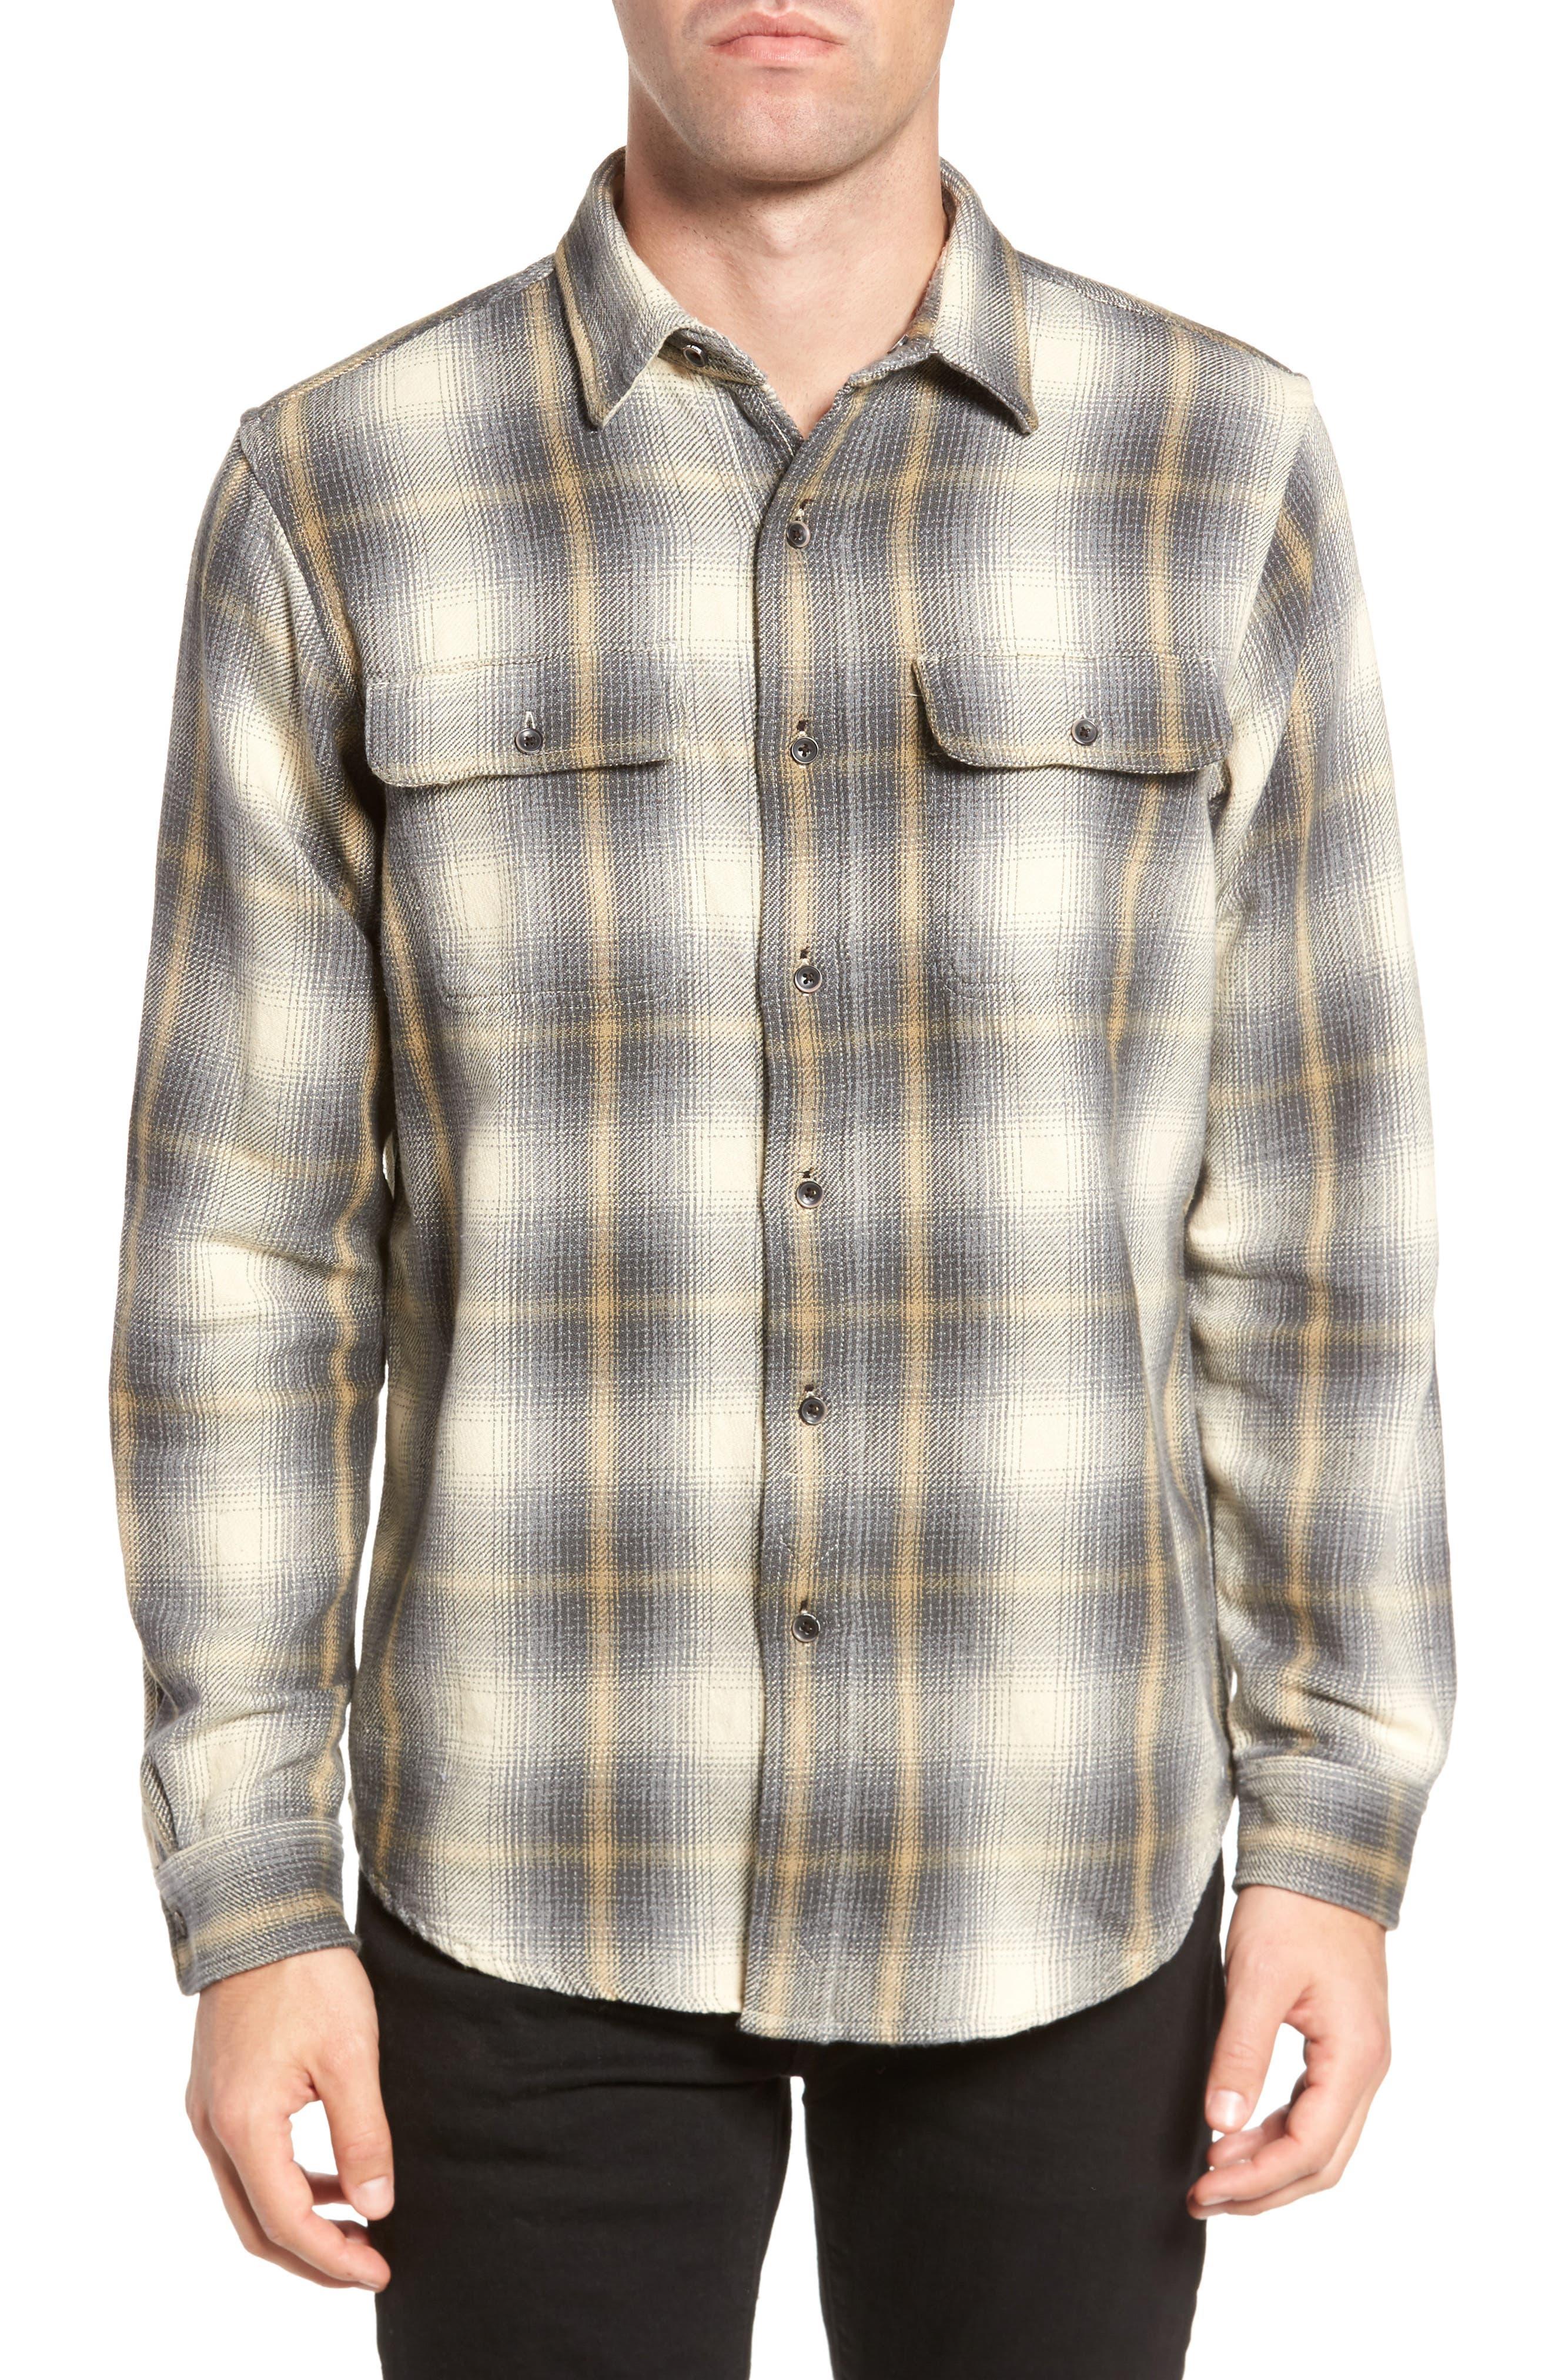 Main Image - Tailor Vintage Heavy Twill Reversible Shirt Jacket